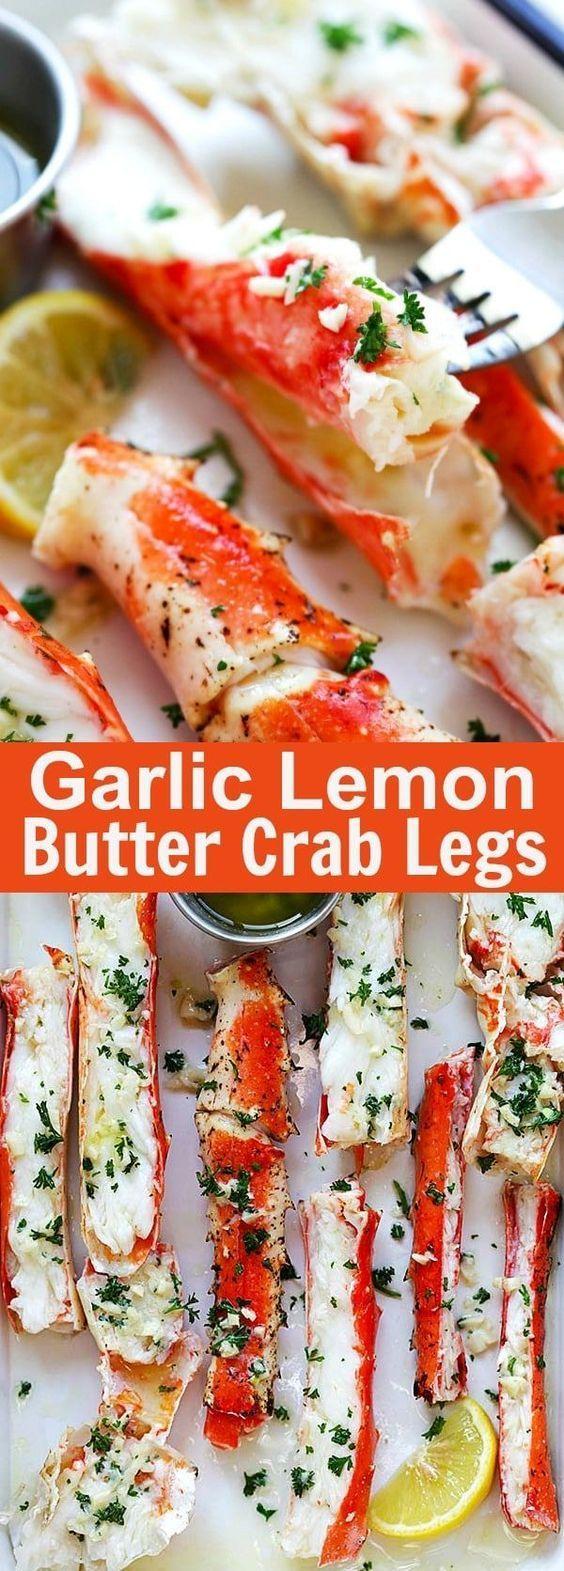 Garlic Lemon Butter Crab Legs